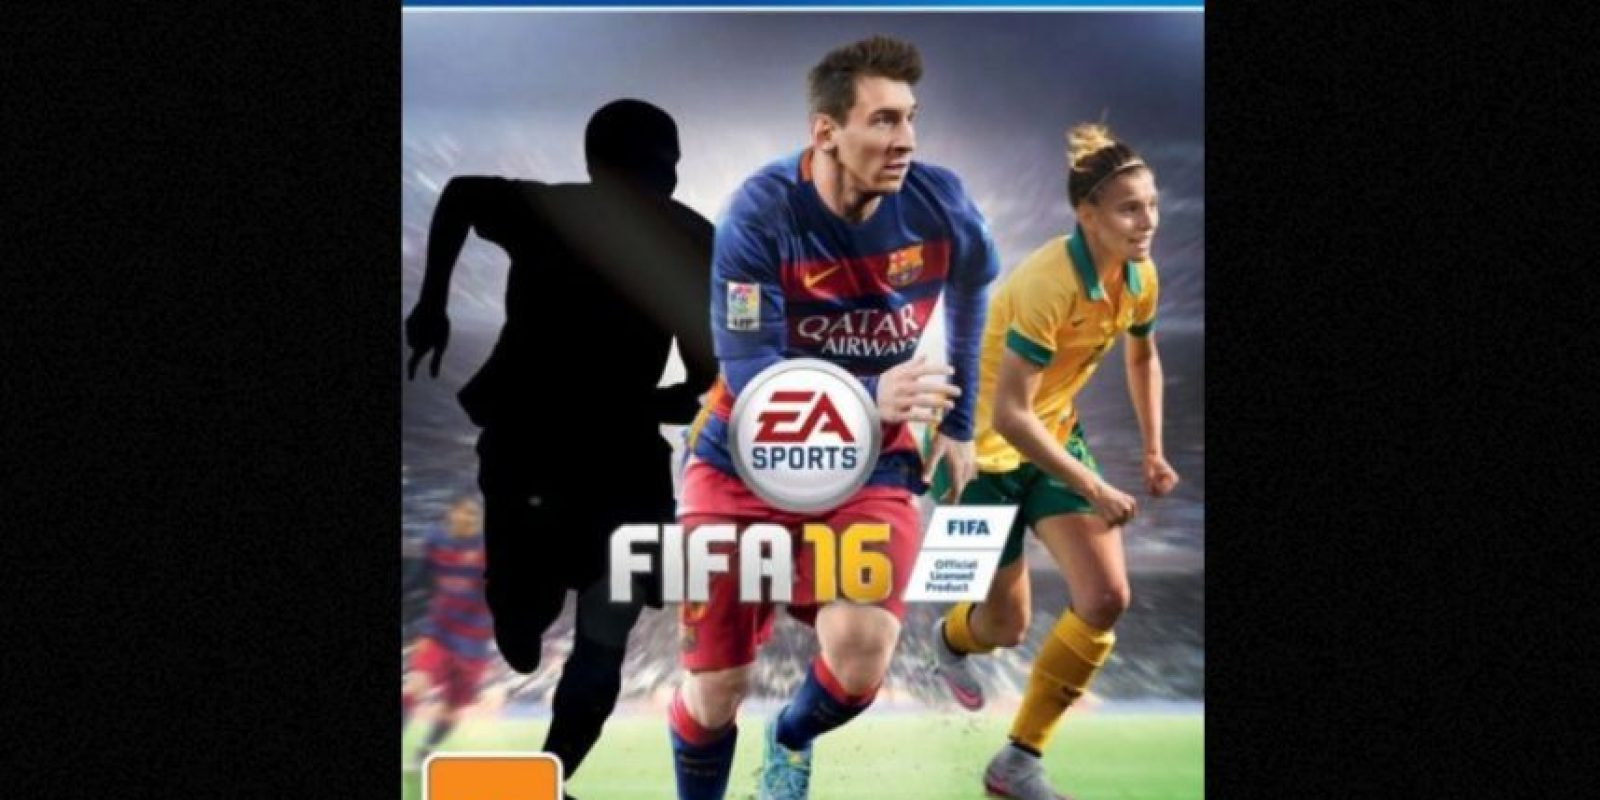 La sombra negra representa otro personaje que falta por revelar. Foto:EA Sports